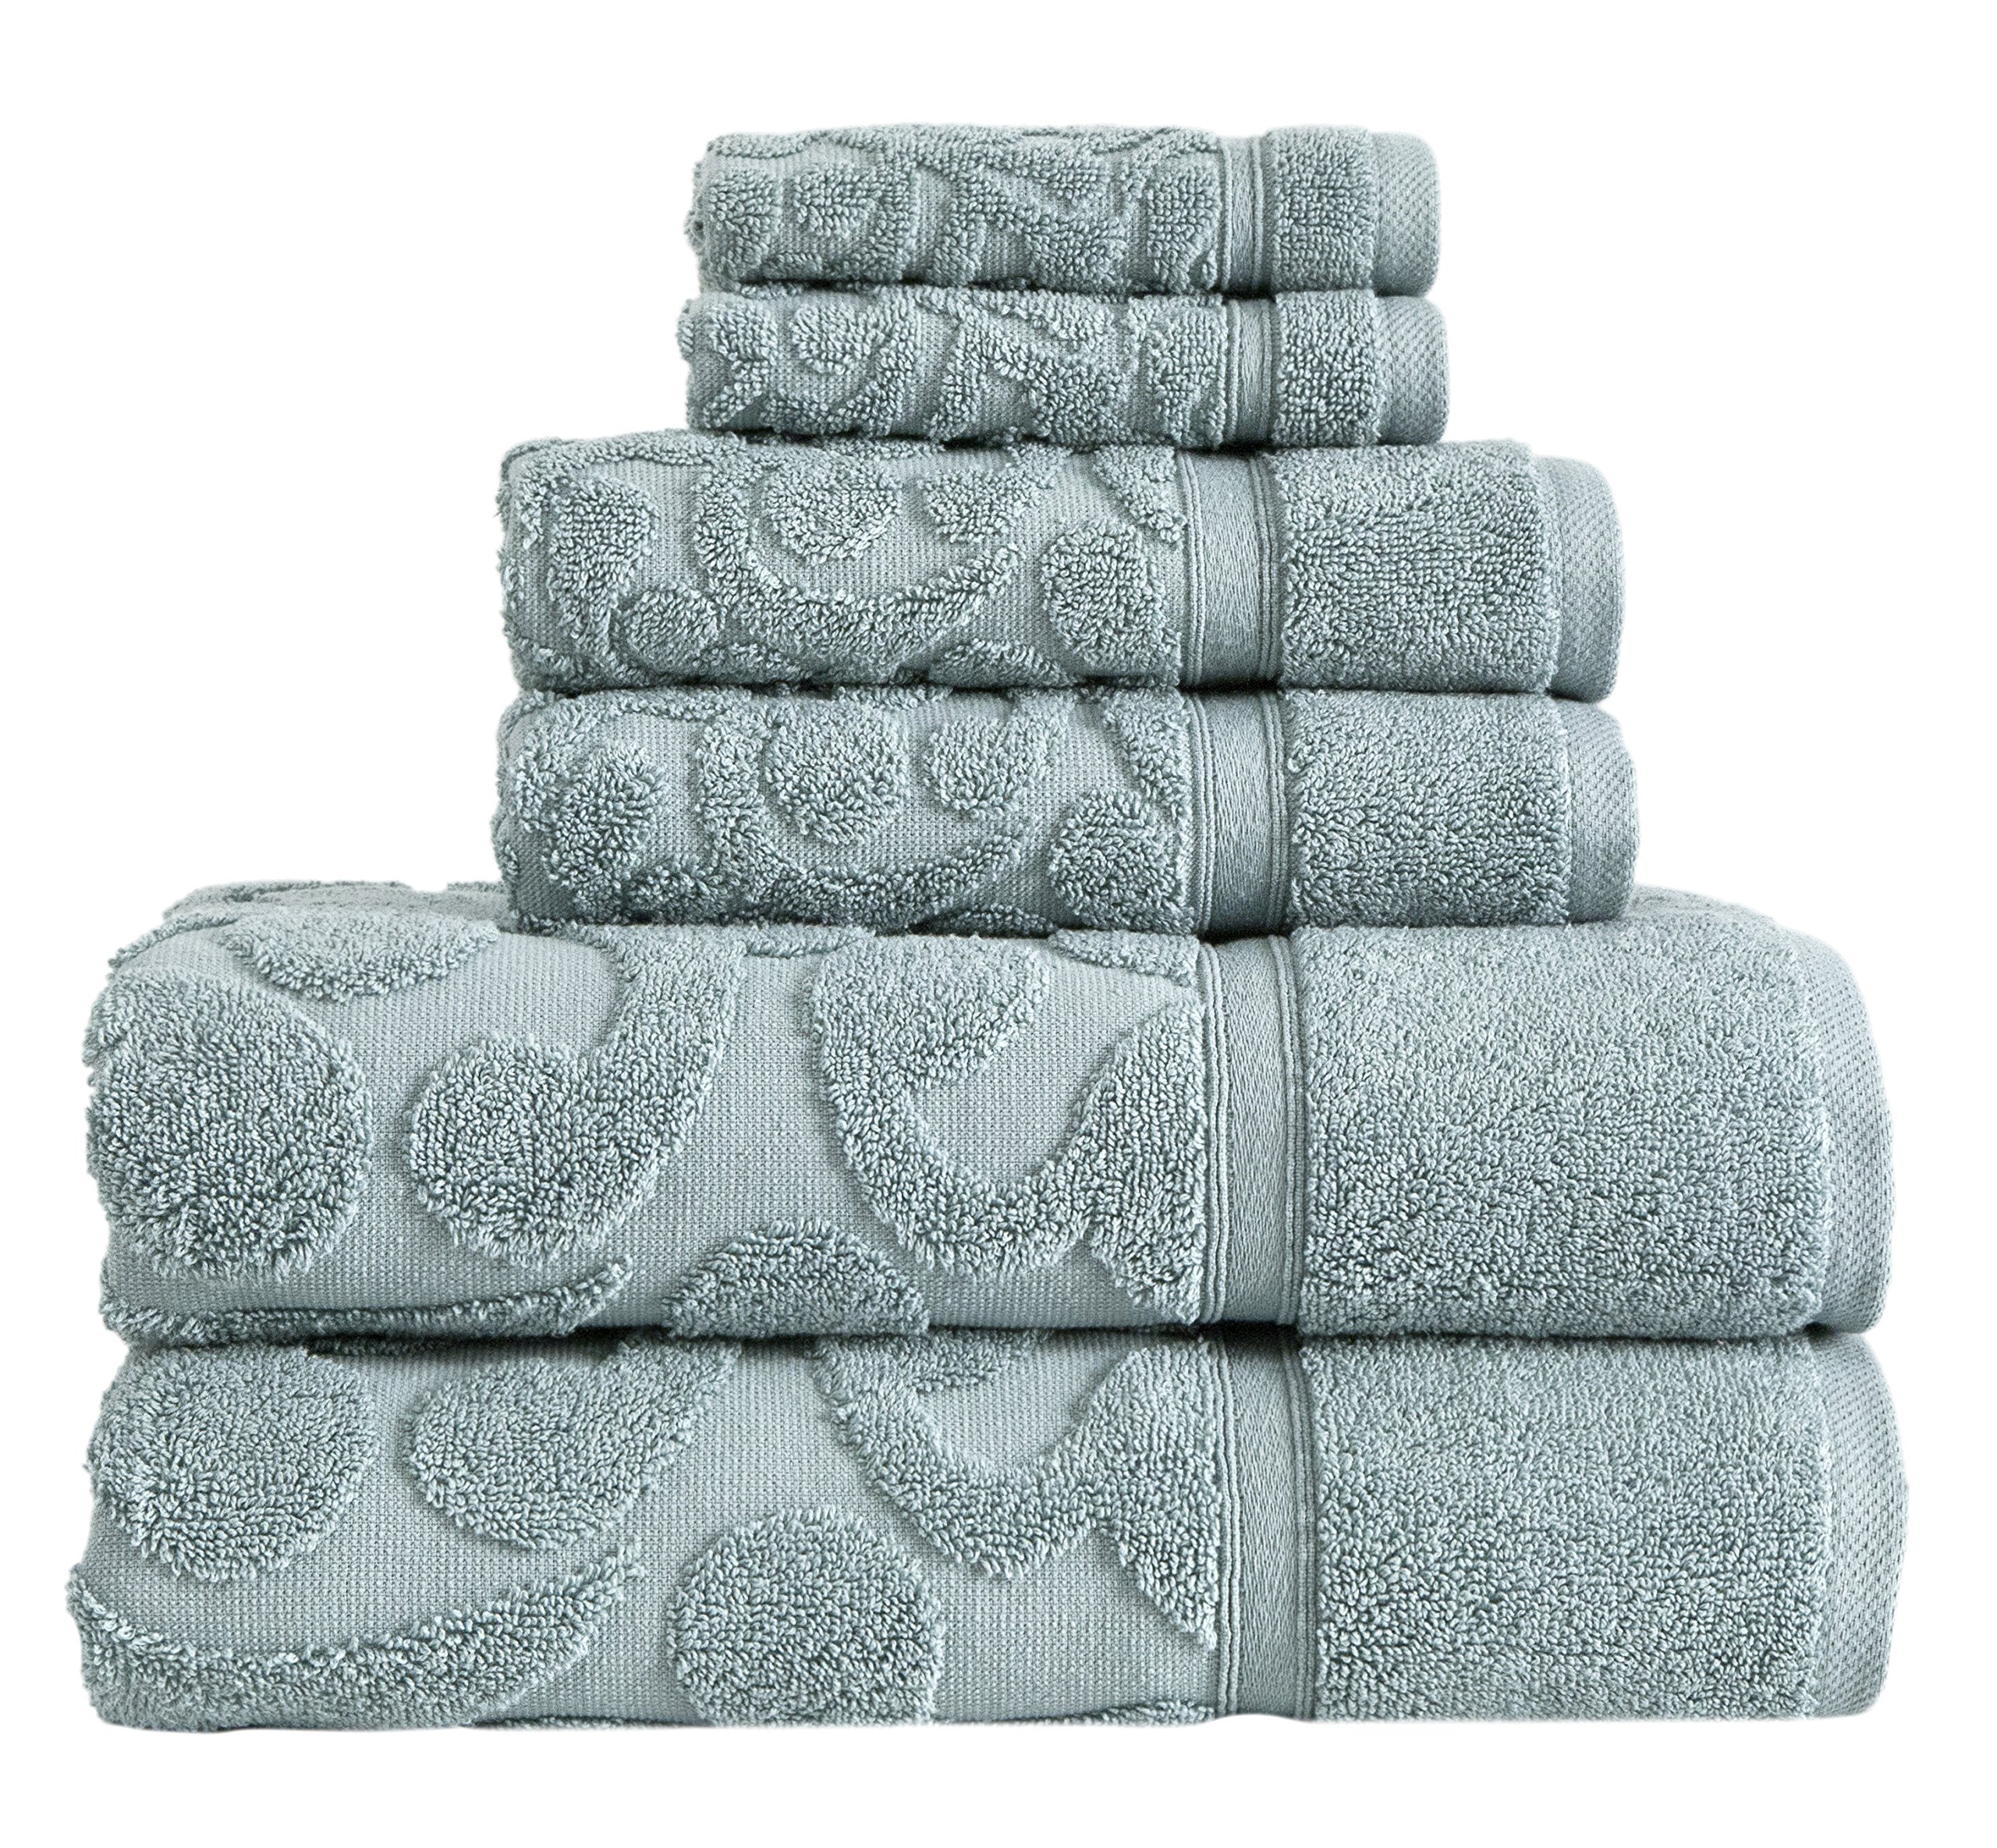 Cheap Turkish Towels Sale, find Turkish Towels Sale deals on line at ...